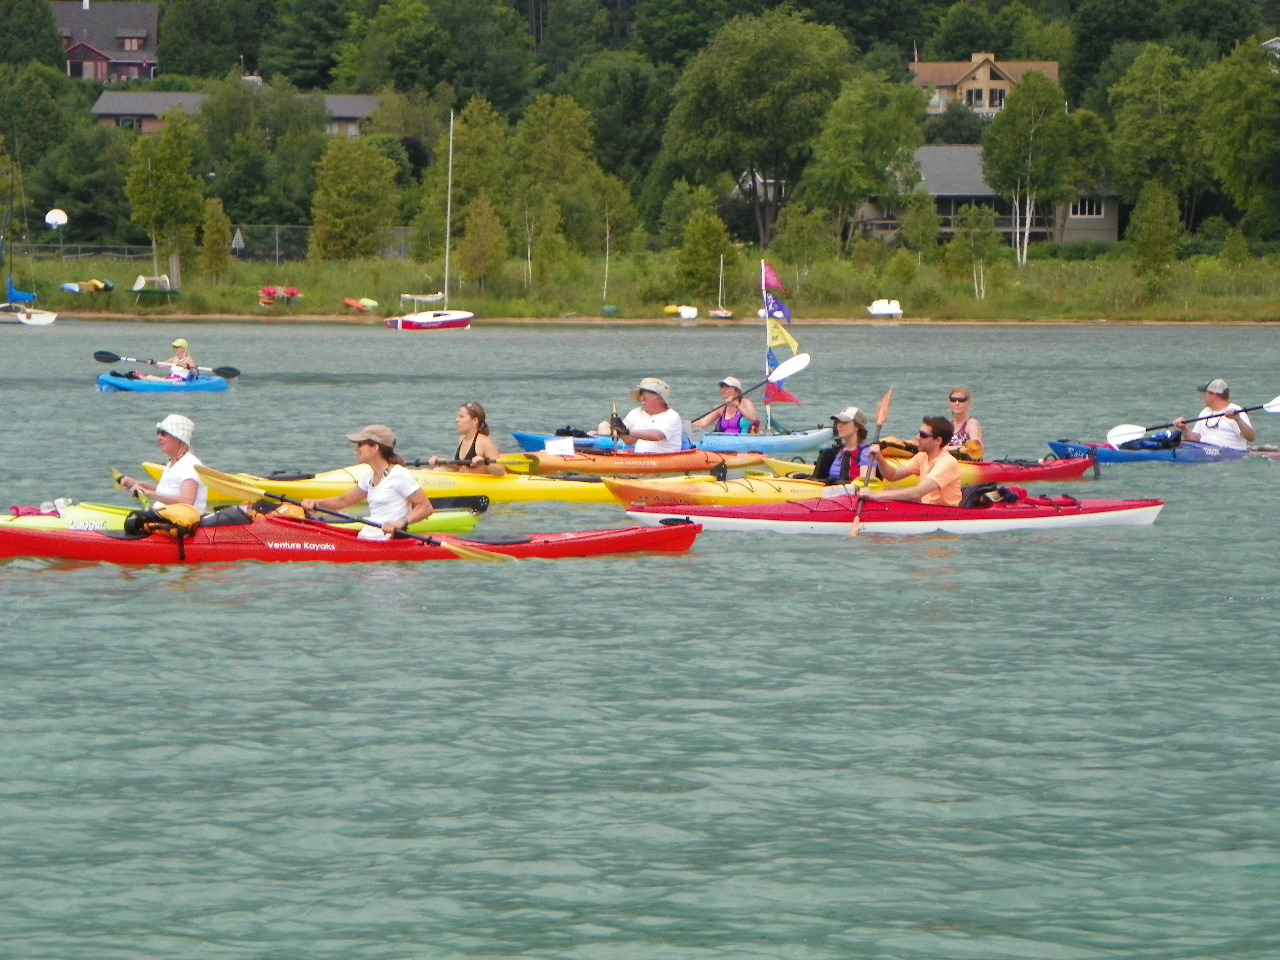 Kayak for a Cause on Walloon Lake